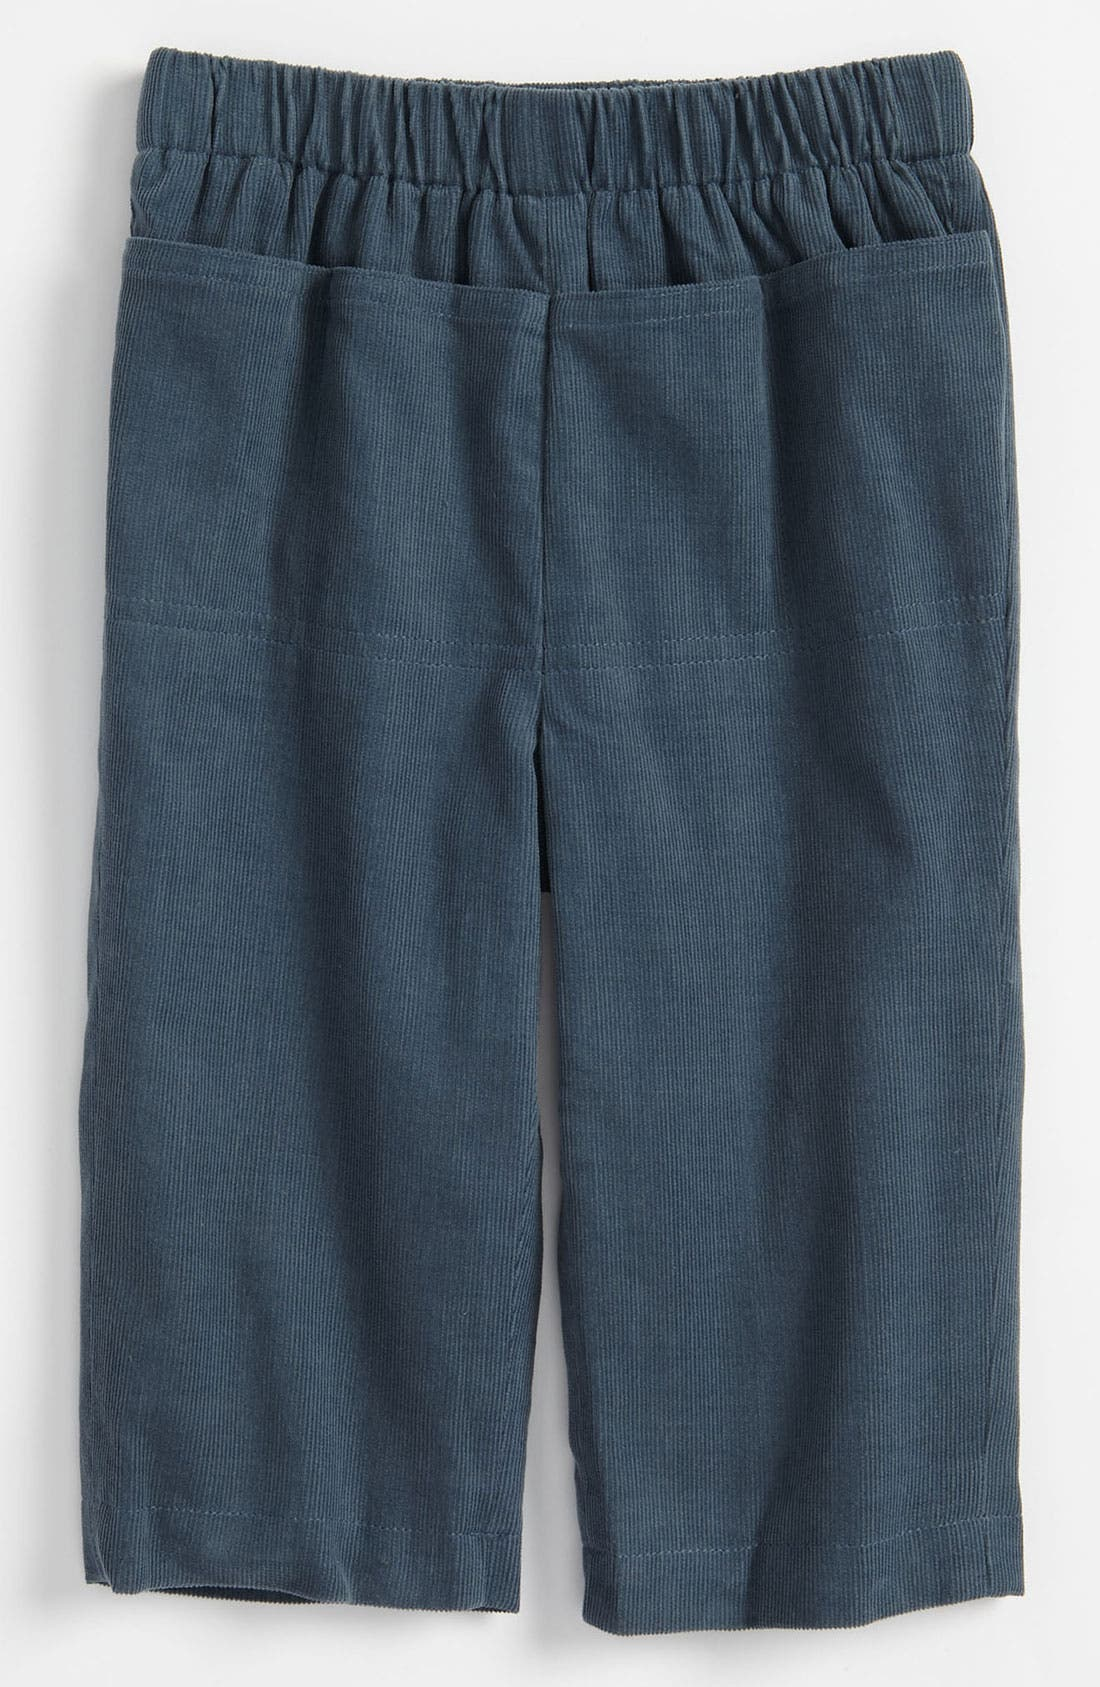 Alternate Image 1 Selected - Marie-Chantal Corduroy Pants (Infant)